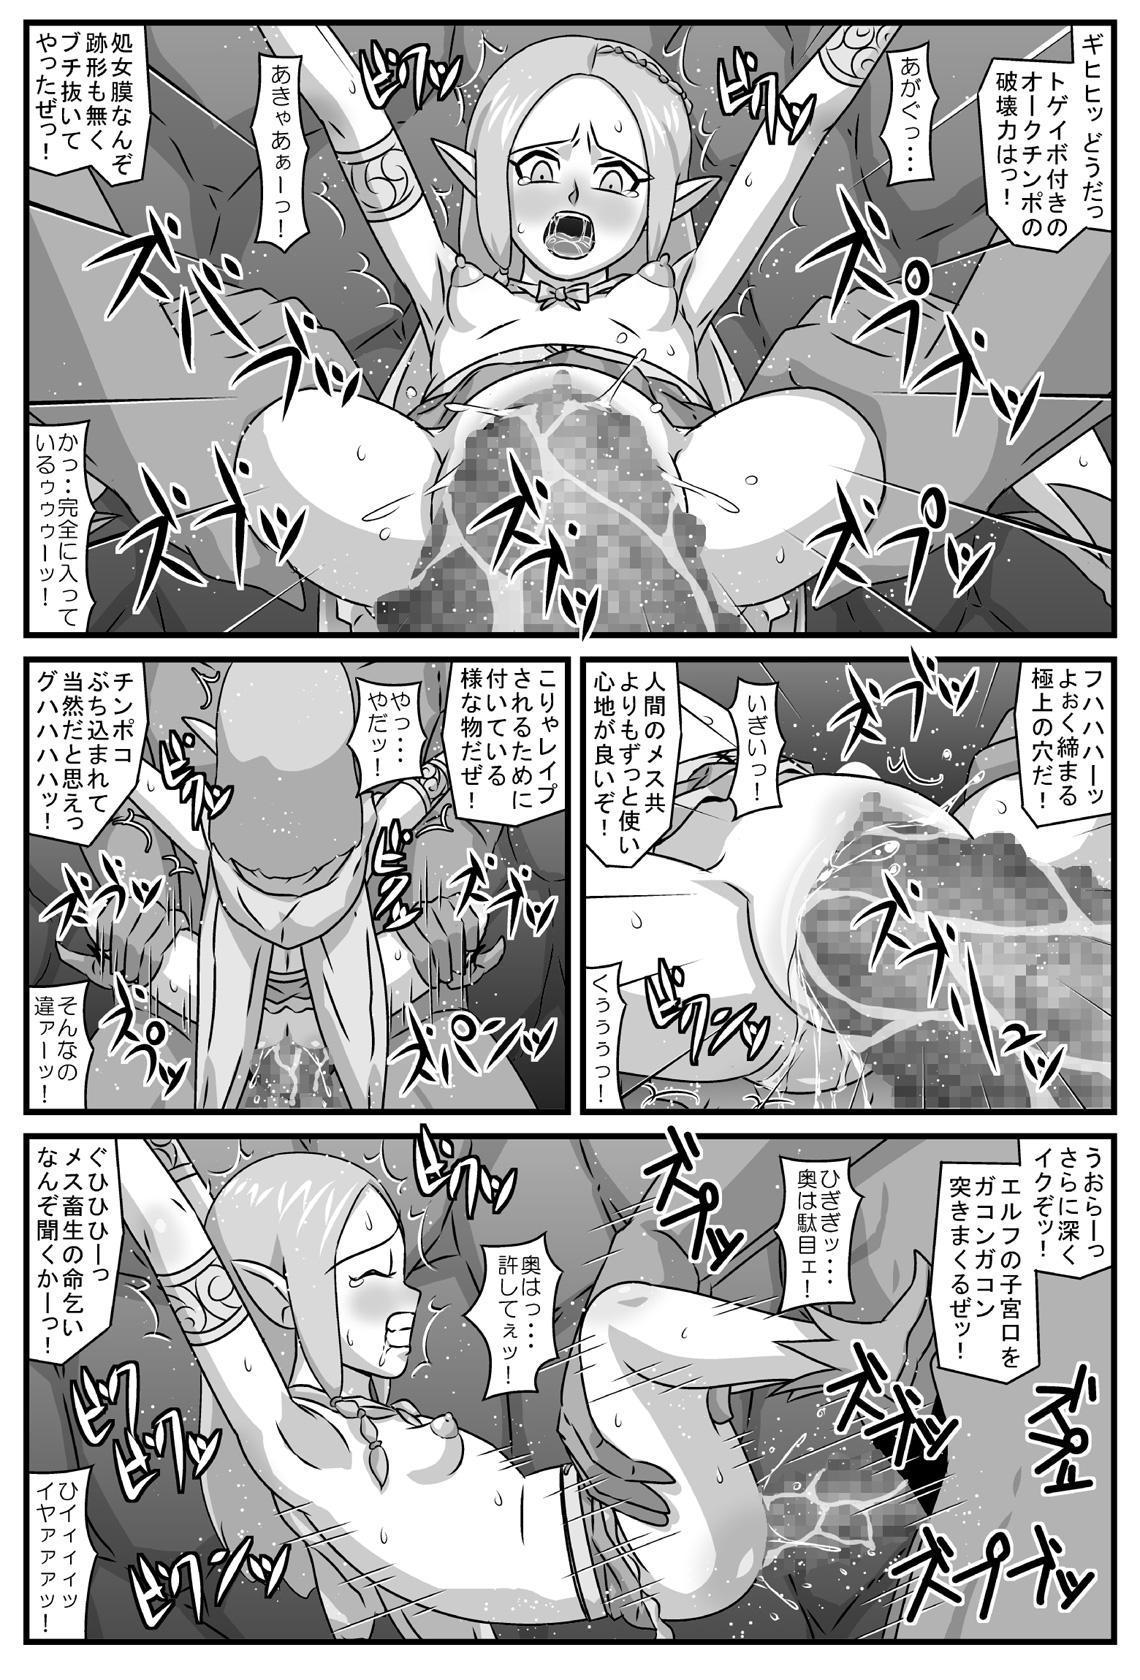 Elf Rinkan ~Kijin-tachi no Seien 7